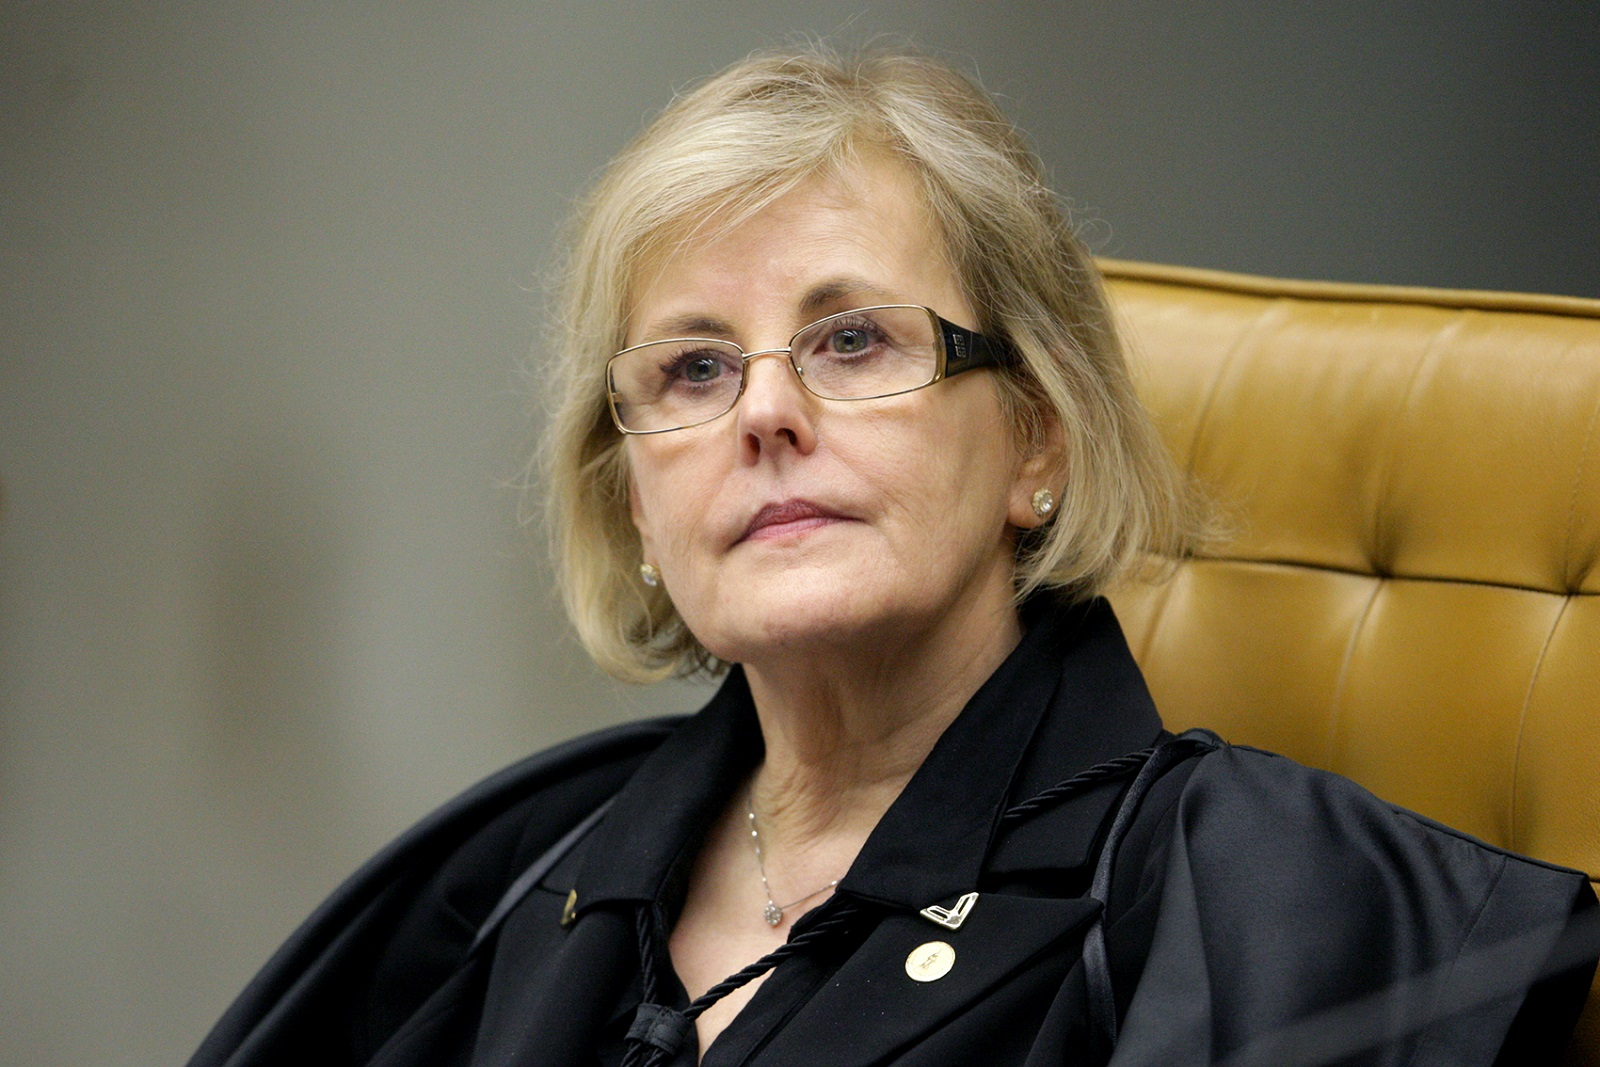 Em vídeo, coronel chama Ministra Rosa Weber de 'vagabunda'